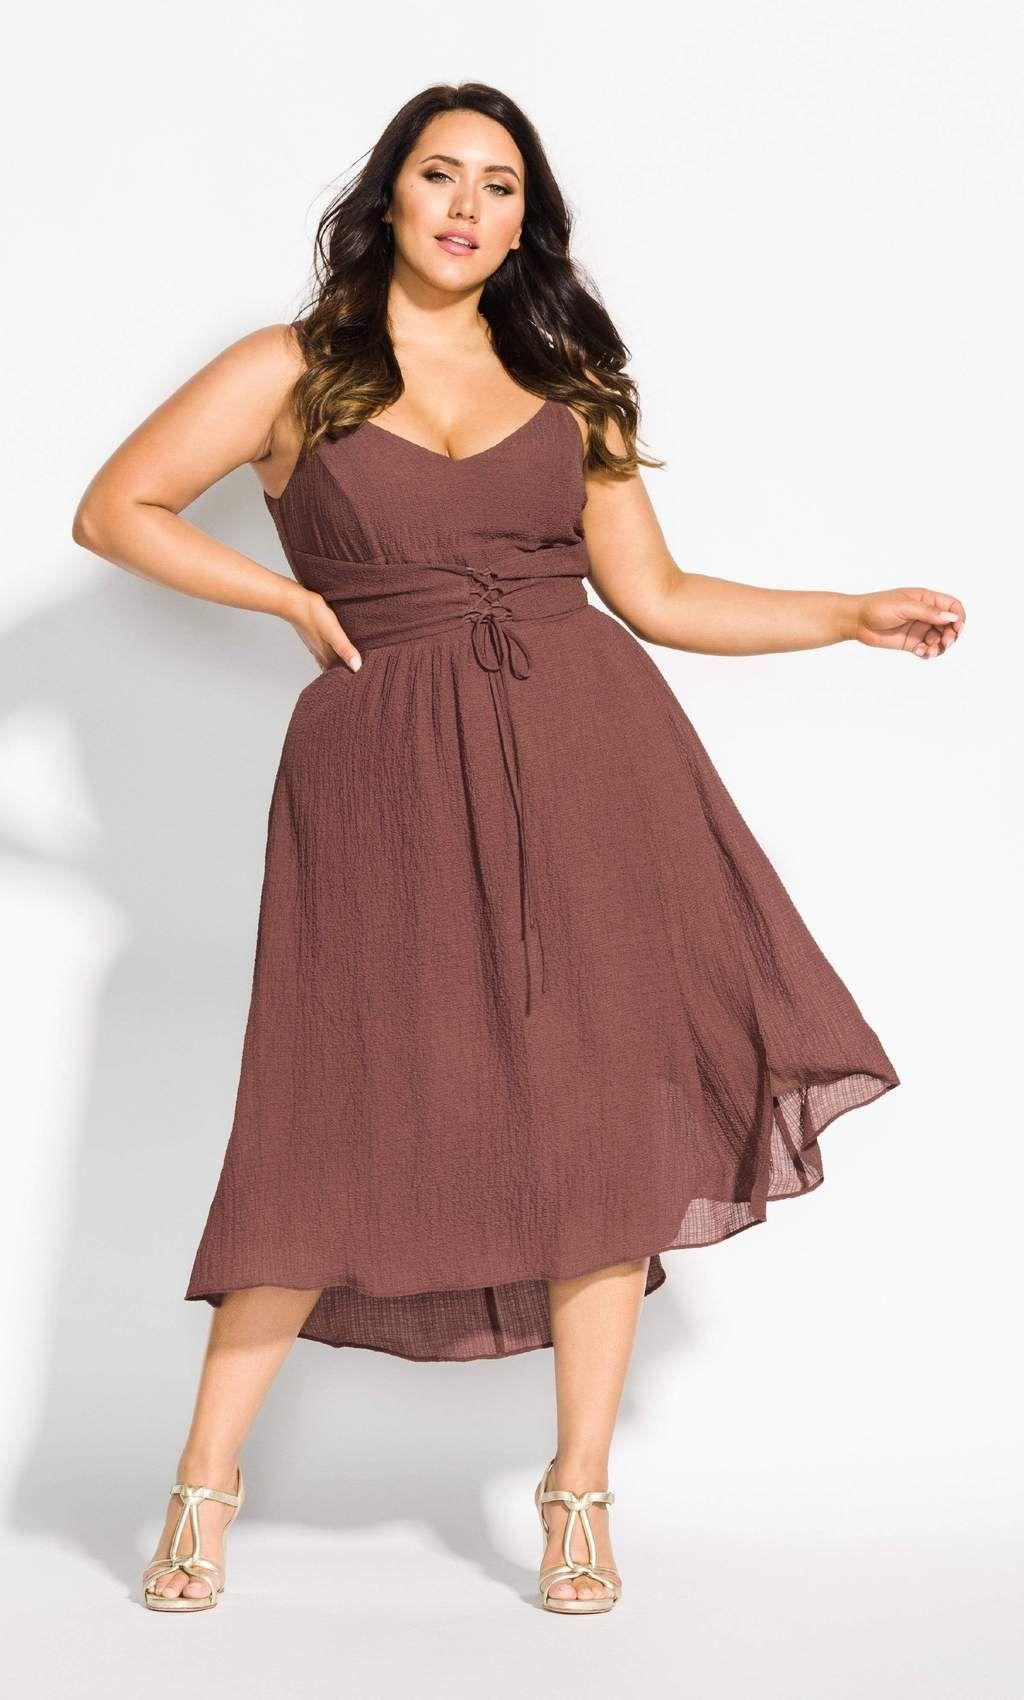 Boho dream dress nutmeg plus size wedding outfits